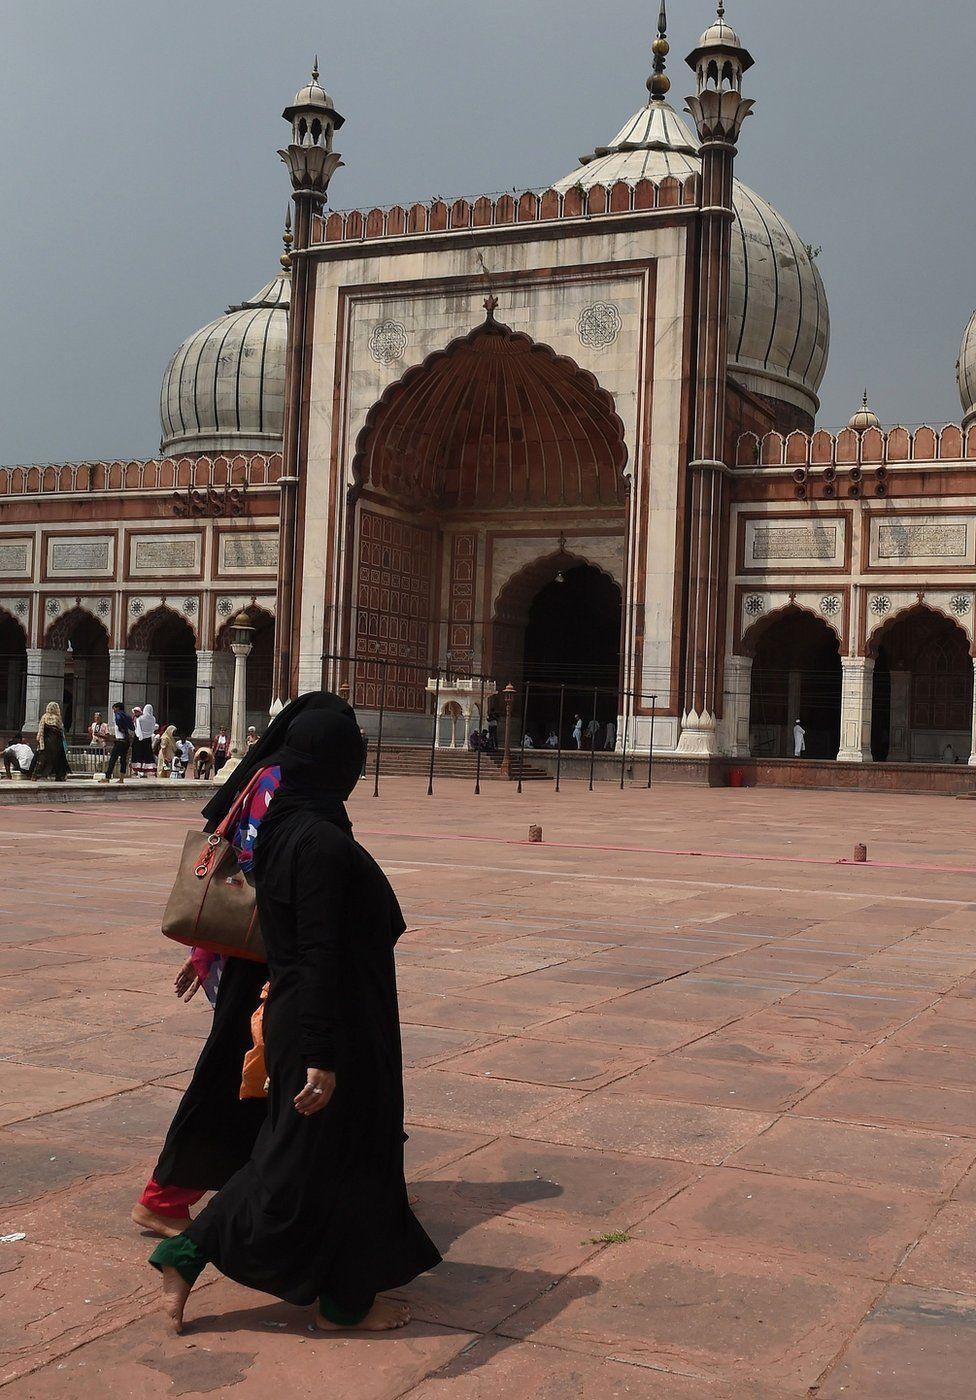 The Hindu-Muslim marriage stuck in India's Supreme Court - BBC News